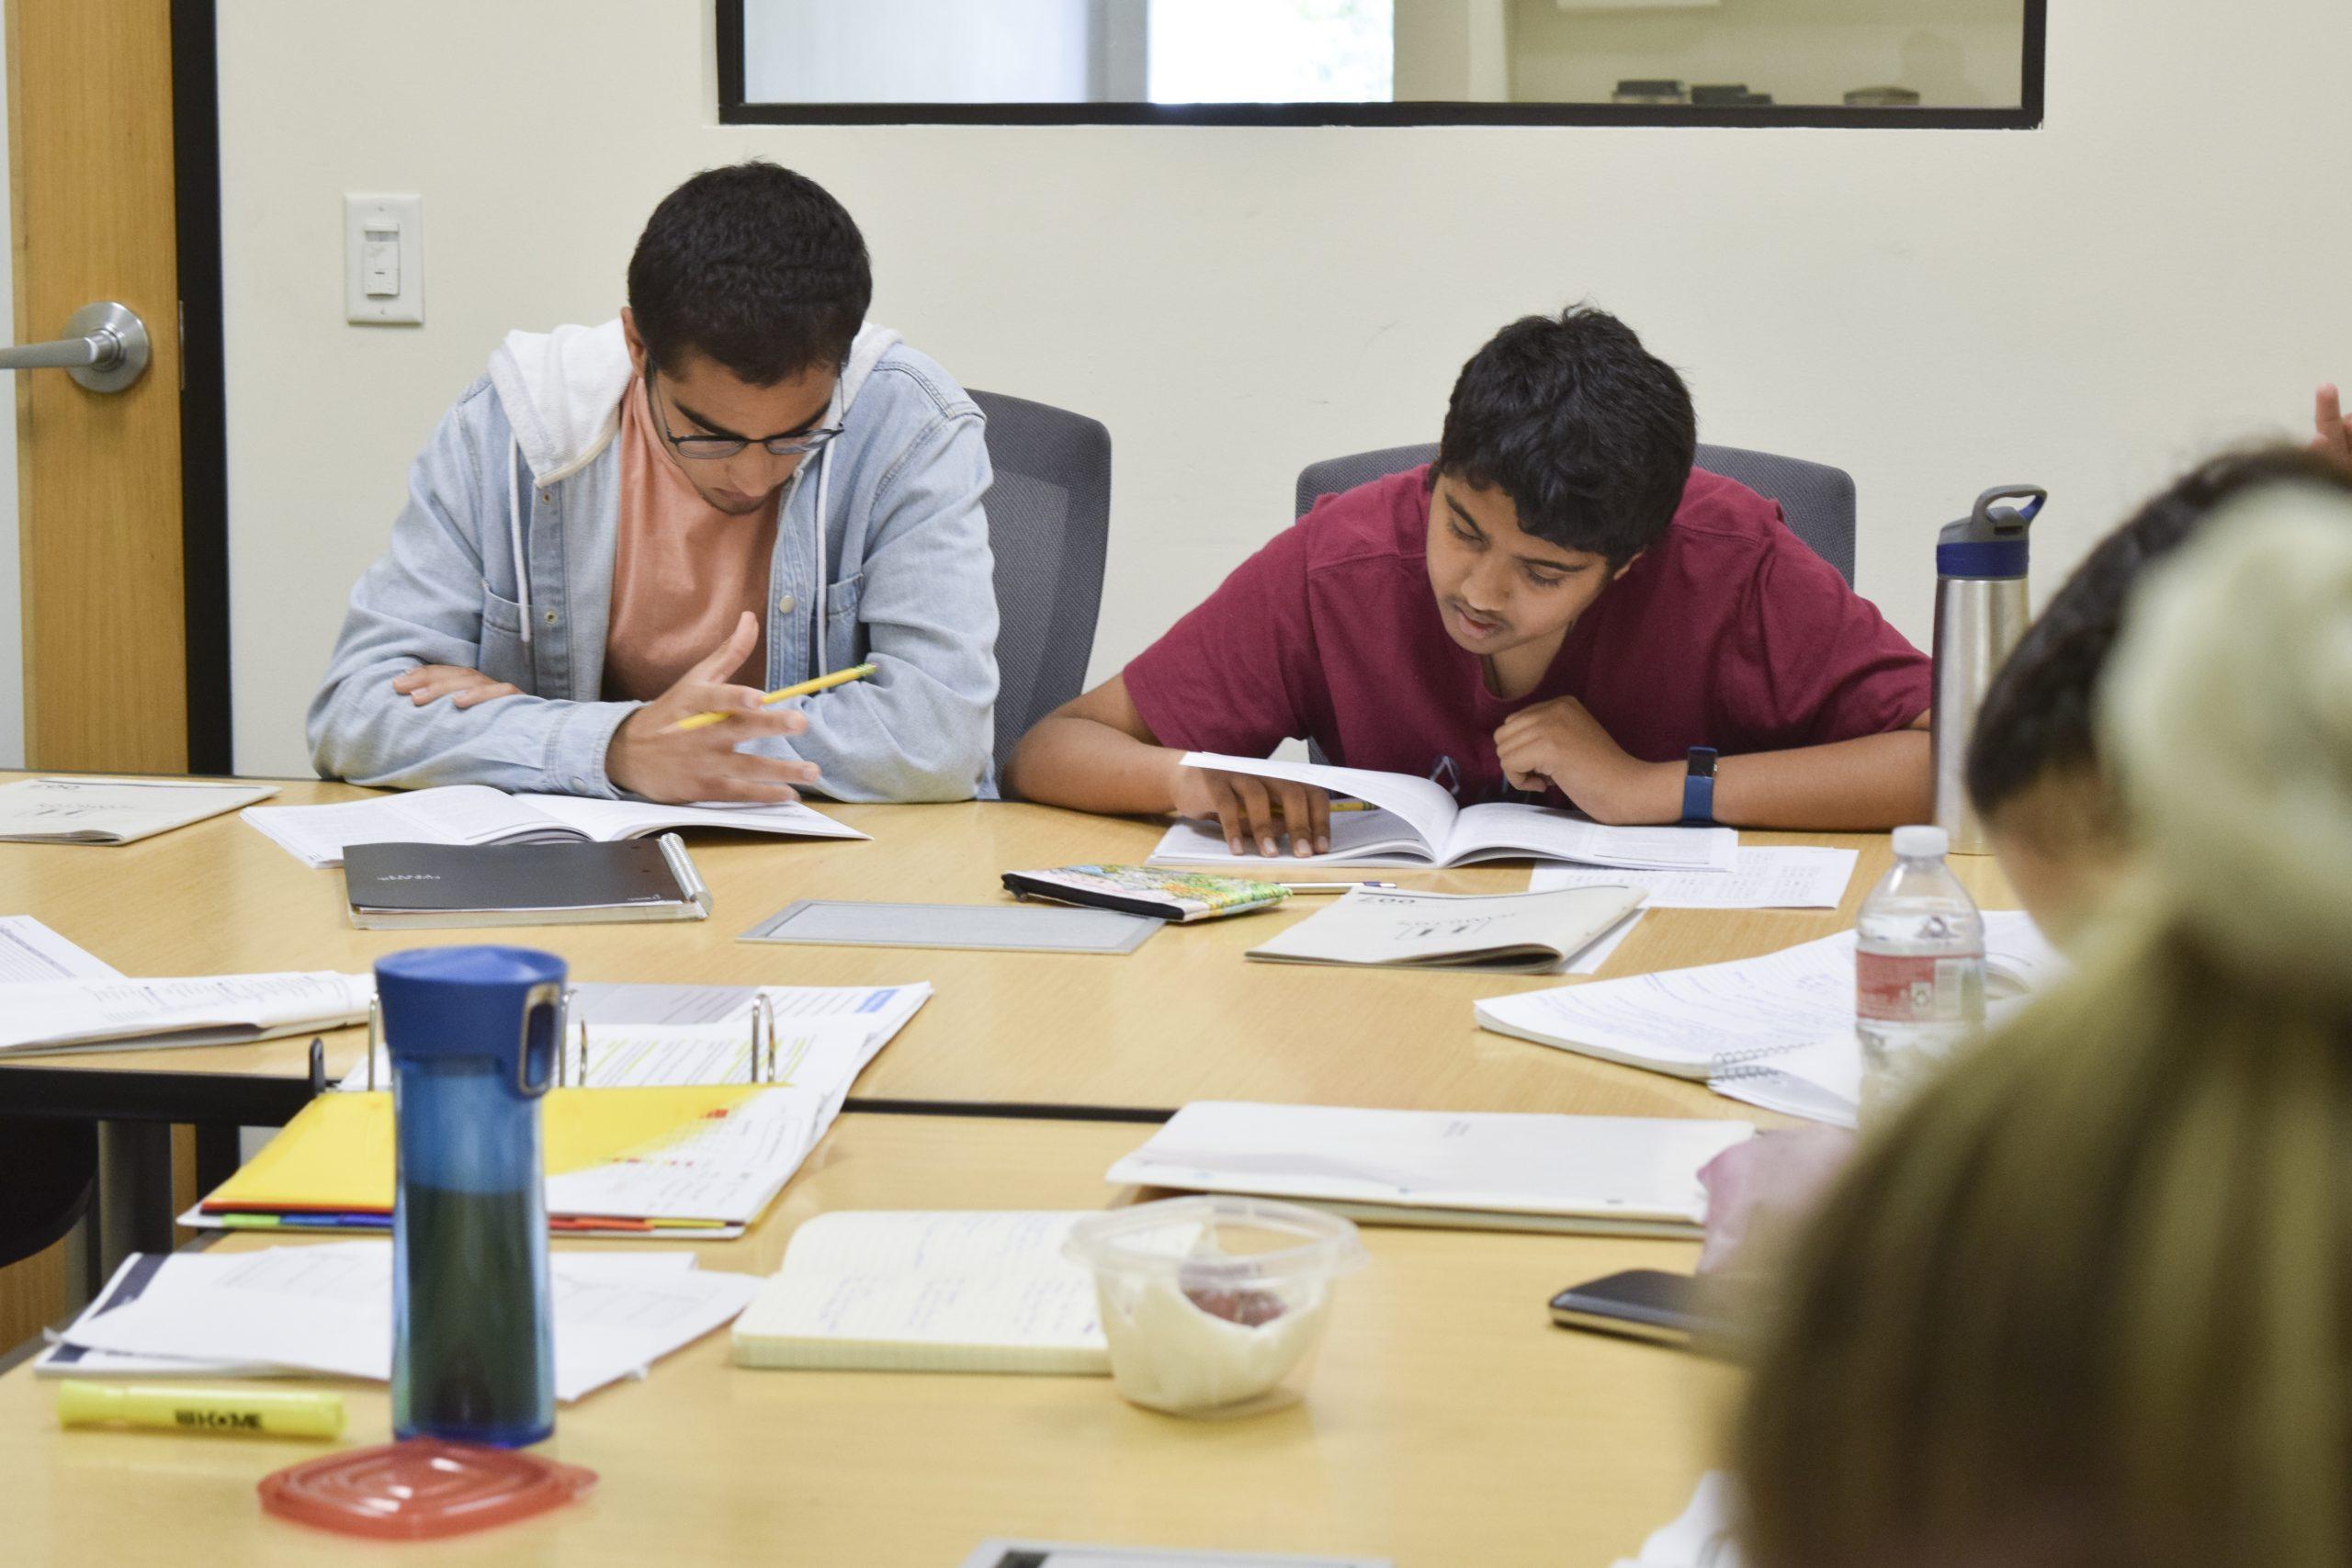 AP Testing during the pandemic, Round 2